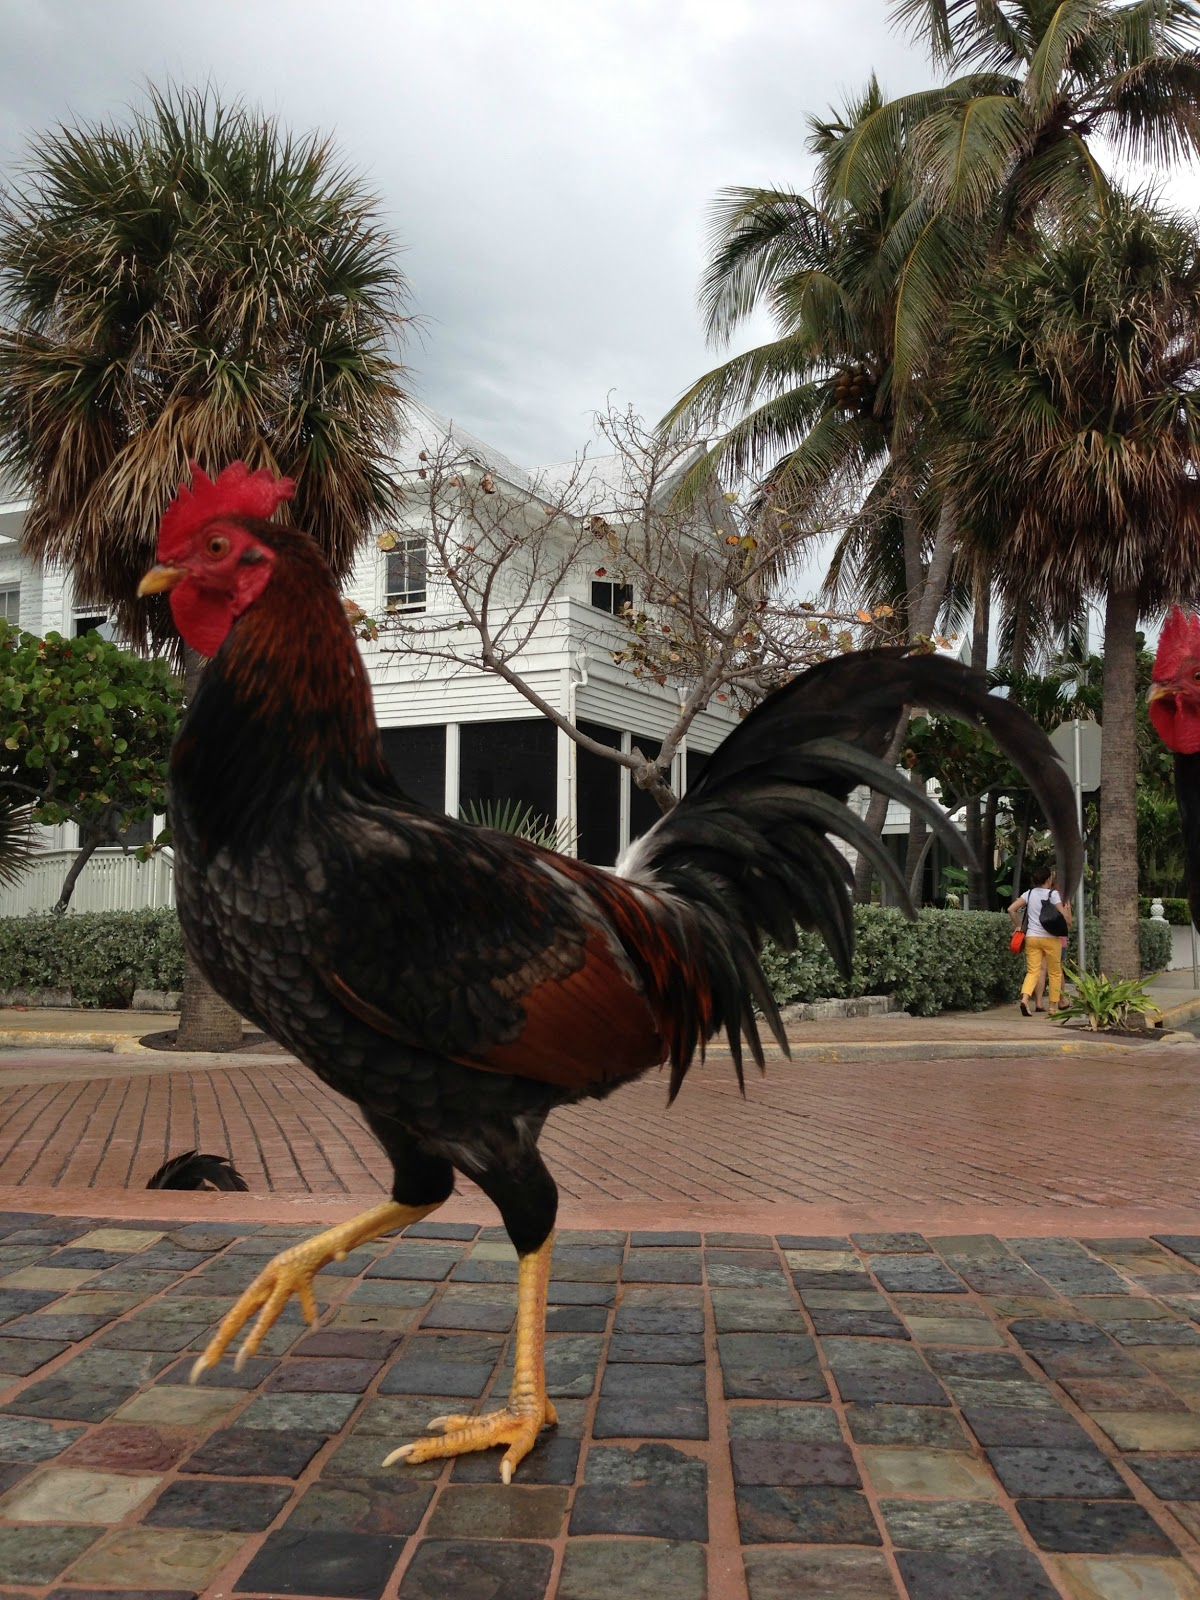 A Tropical Chicken Christmas